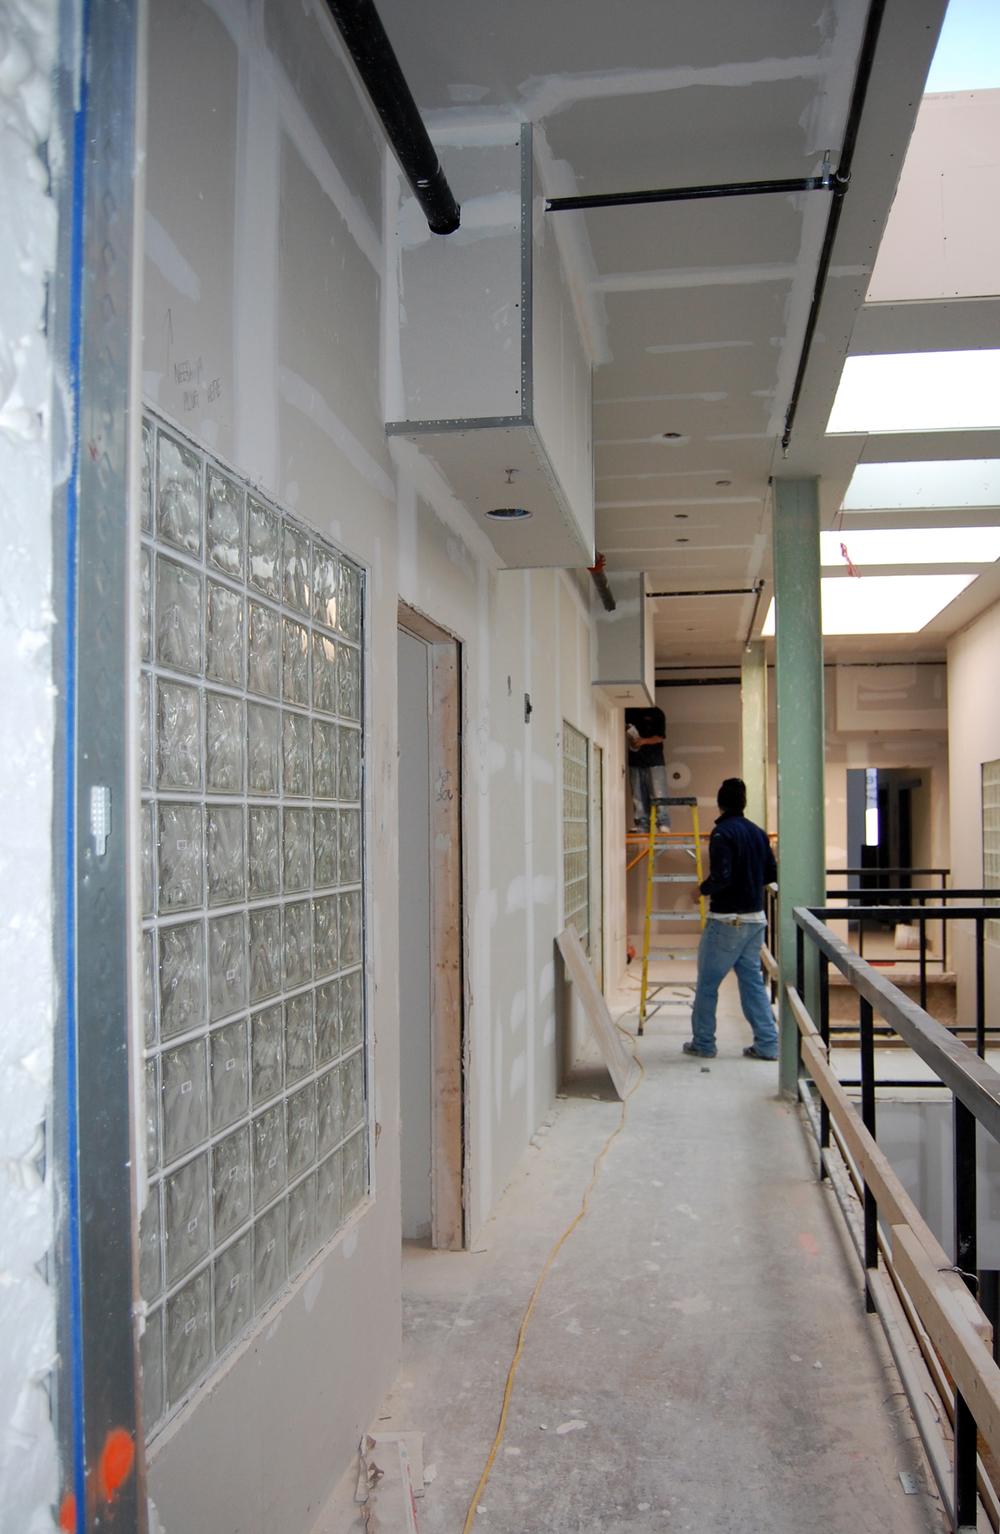 115 E Broad - Corridor.jpg